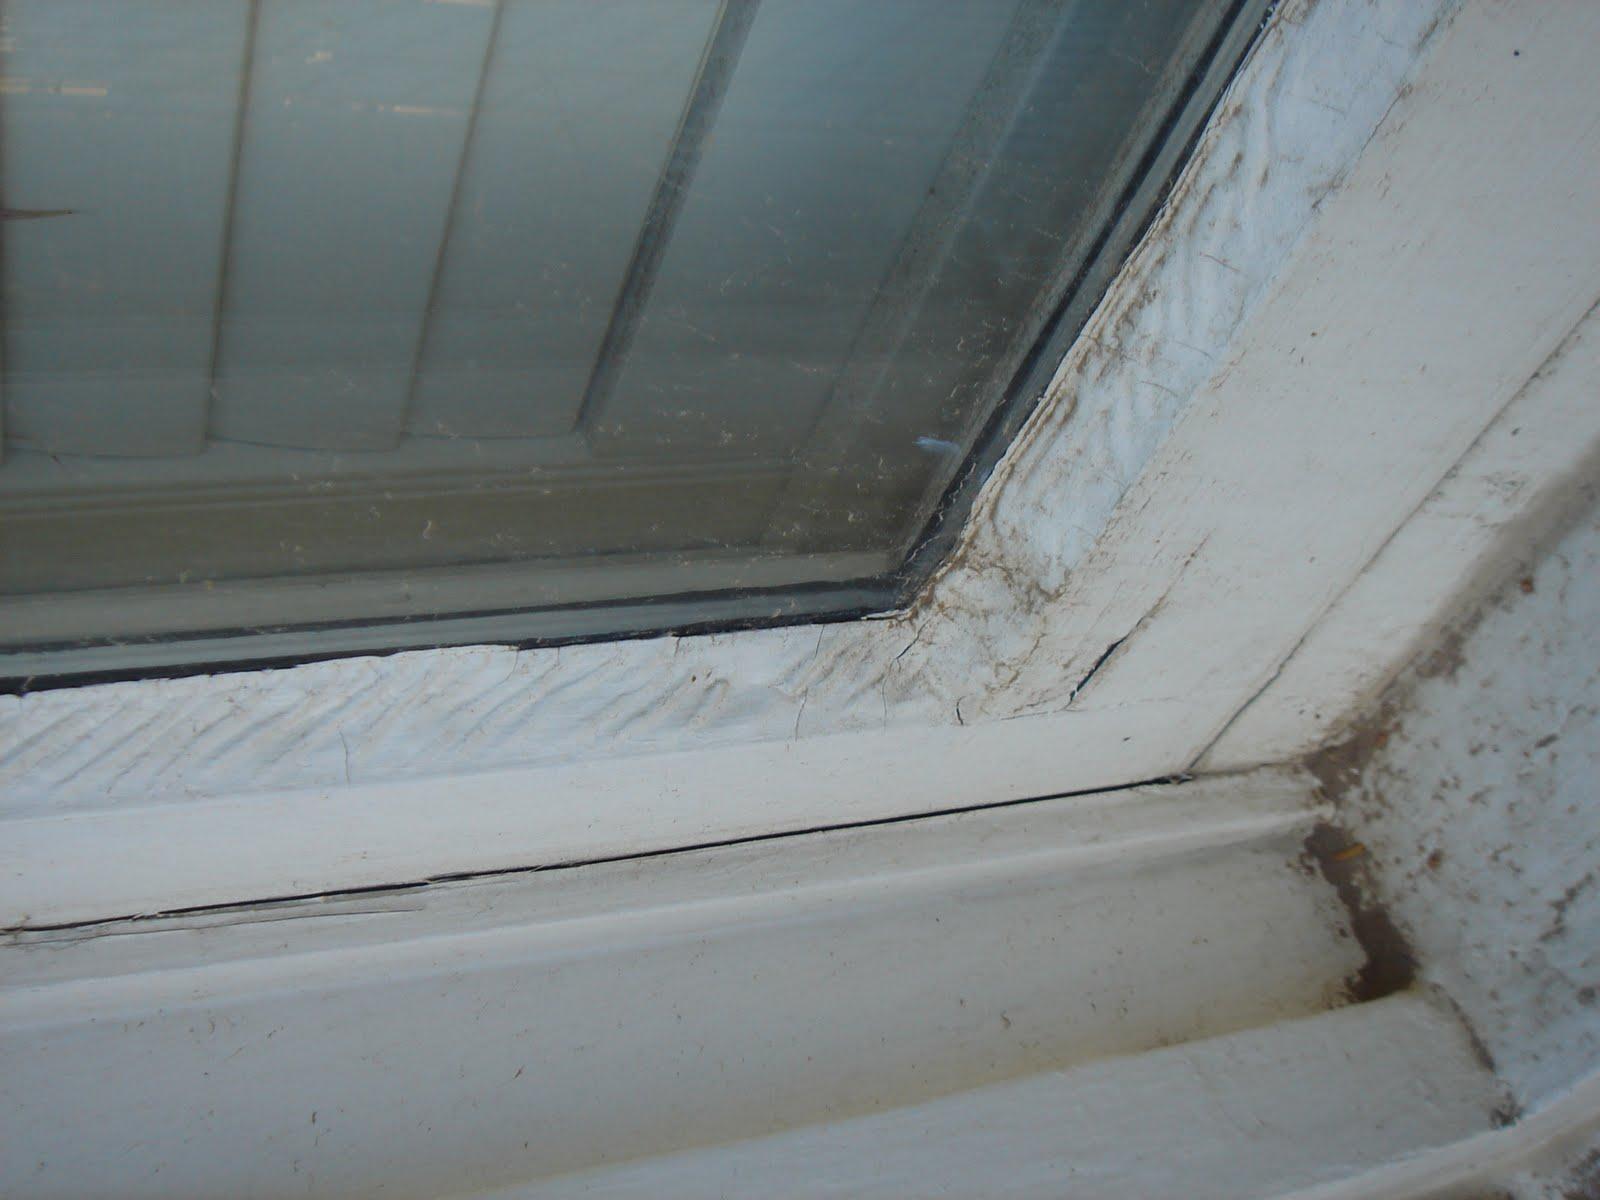 Window Glazing Putty : Historic windows the panes of putty